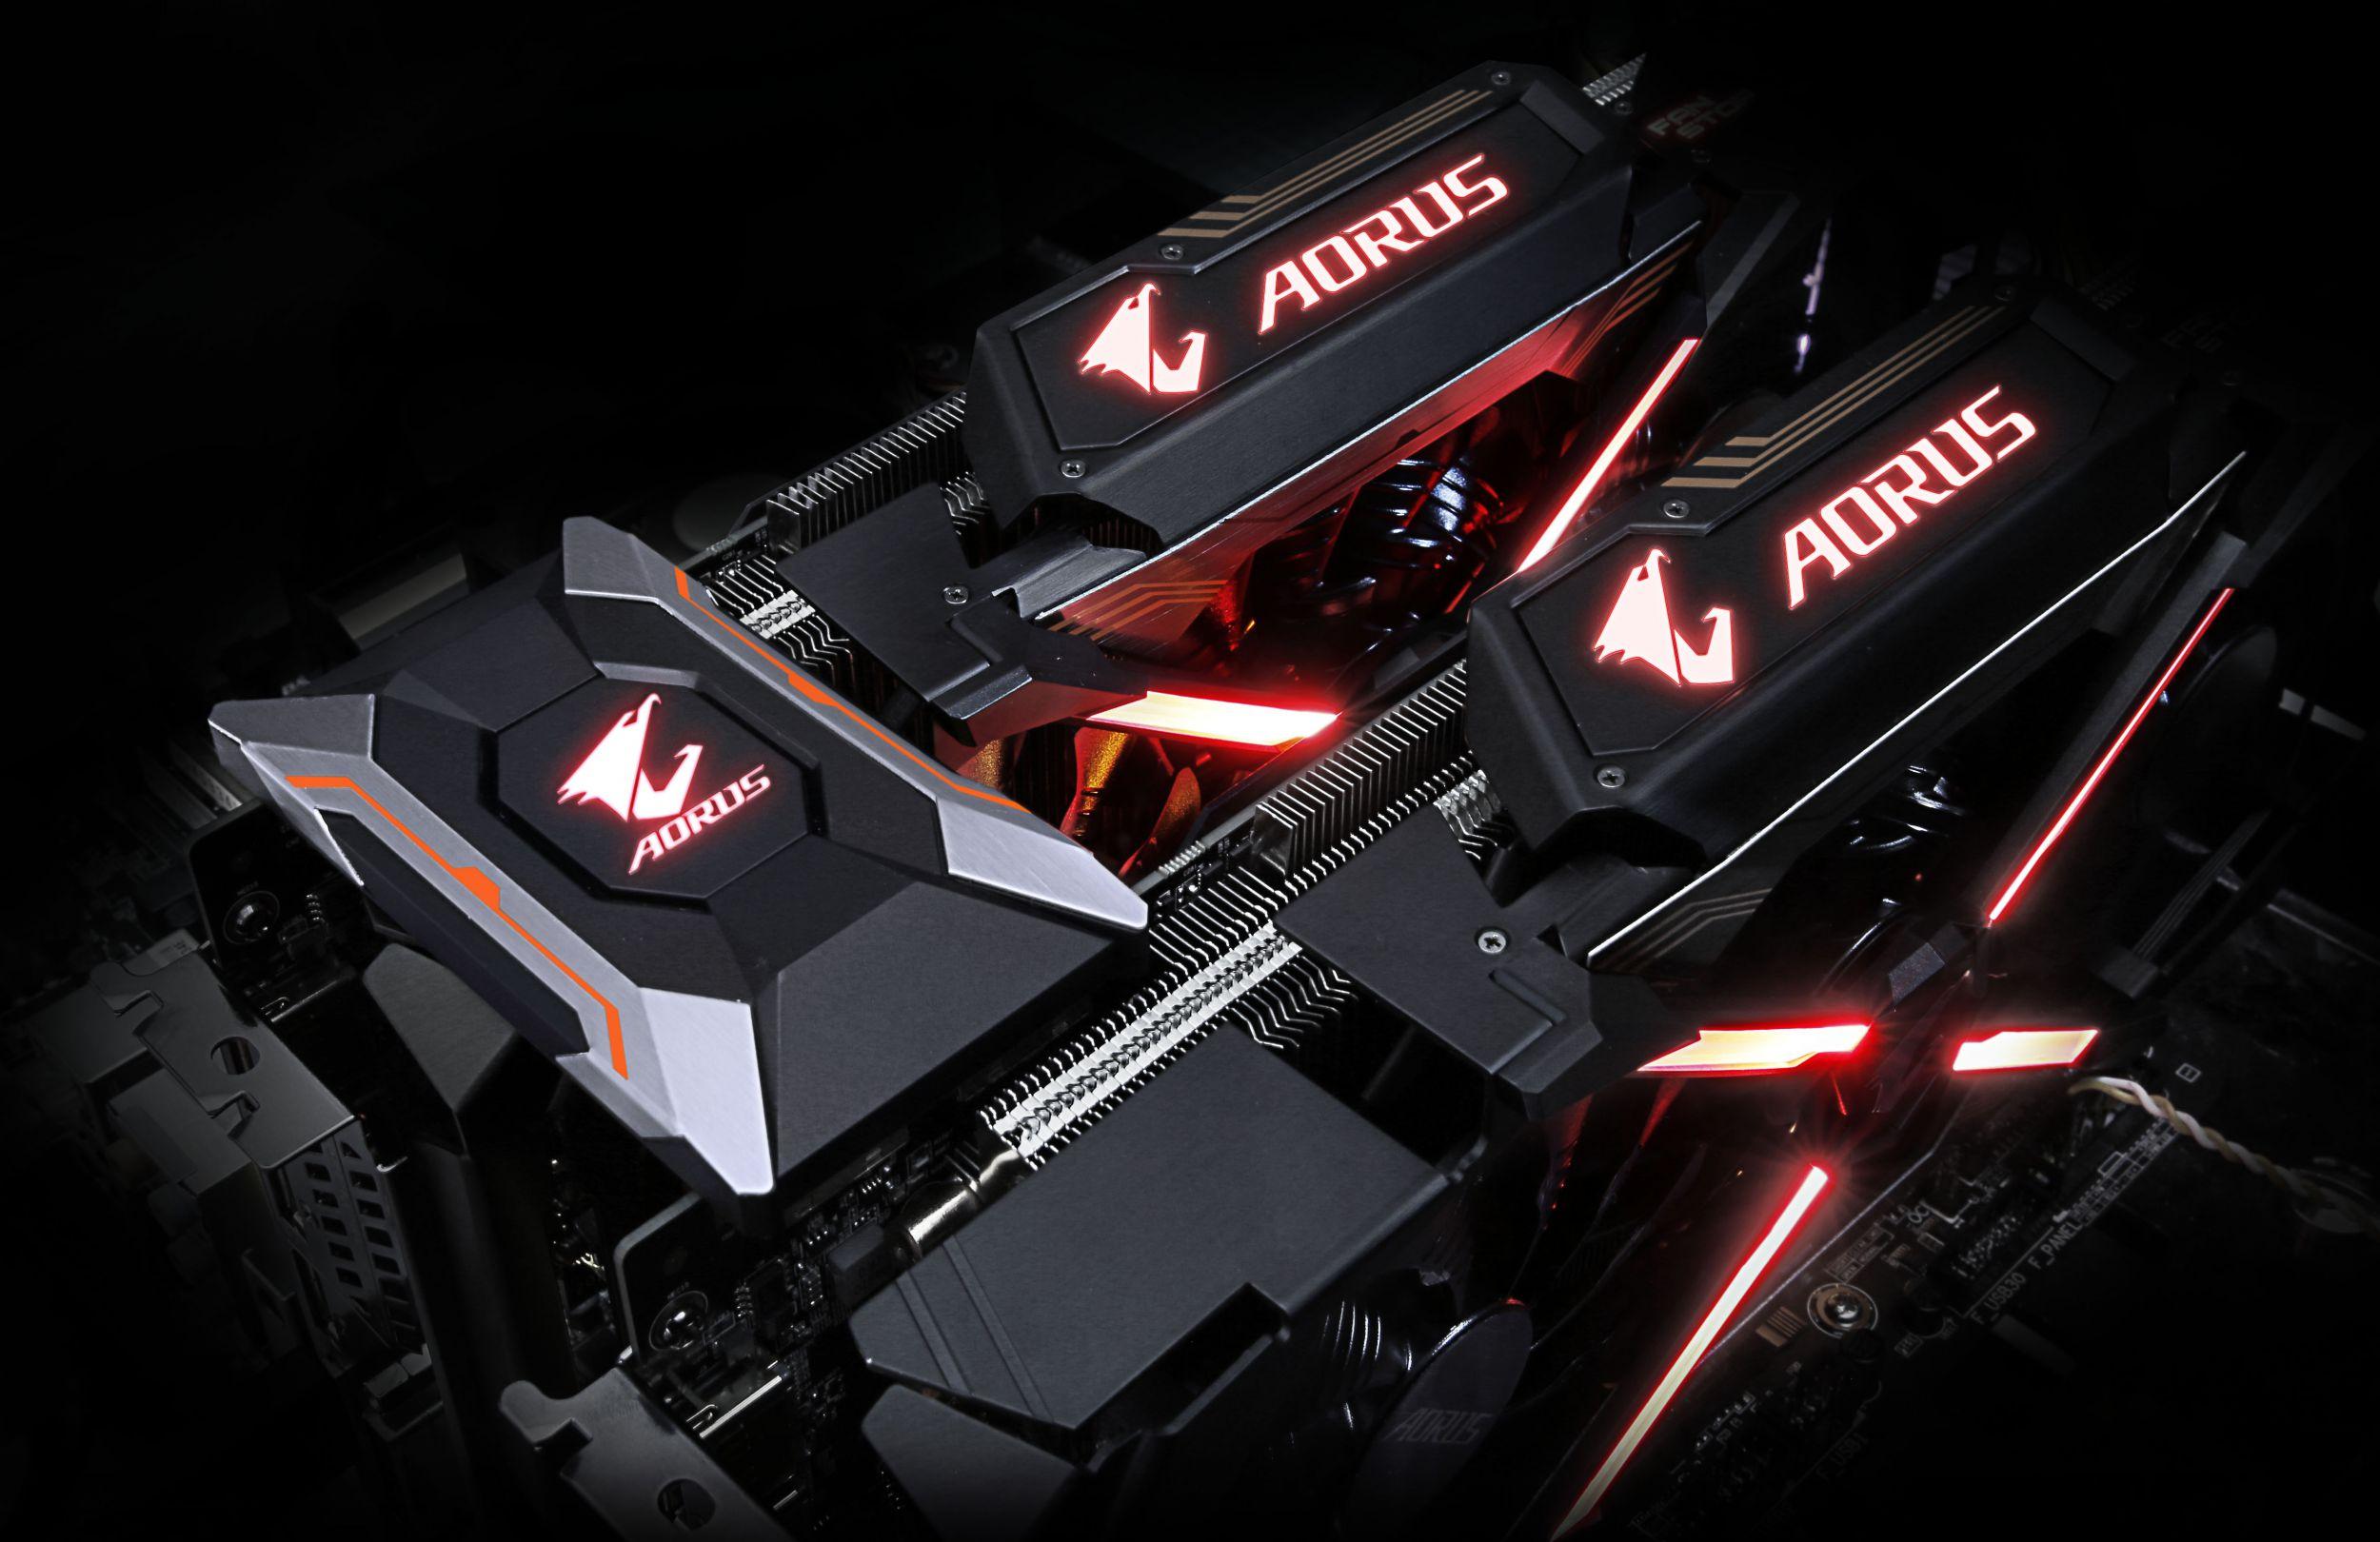 Full AORUS graphics card lineup unveiled | AORUS